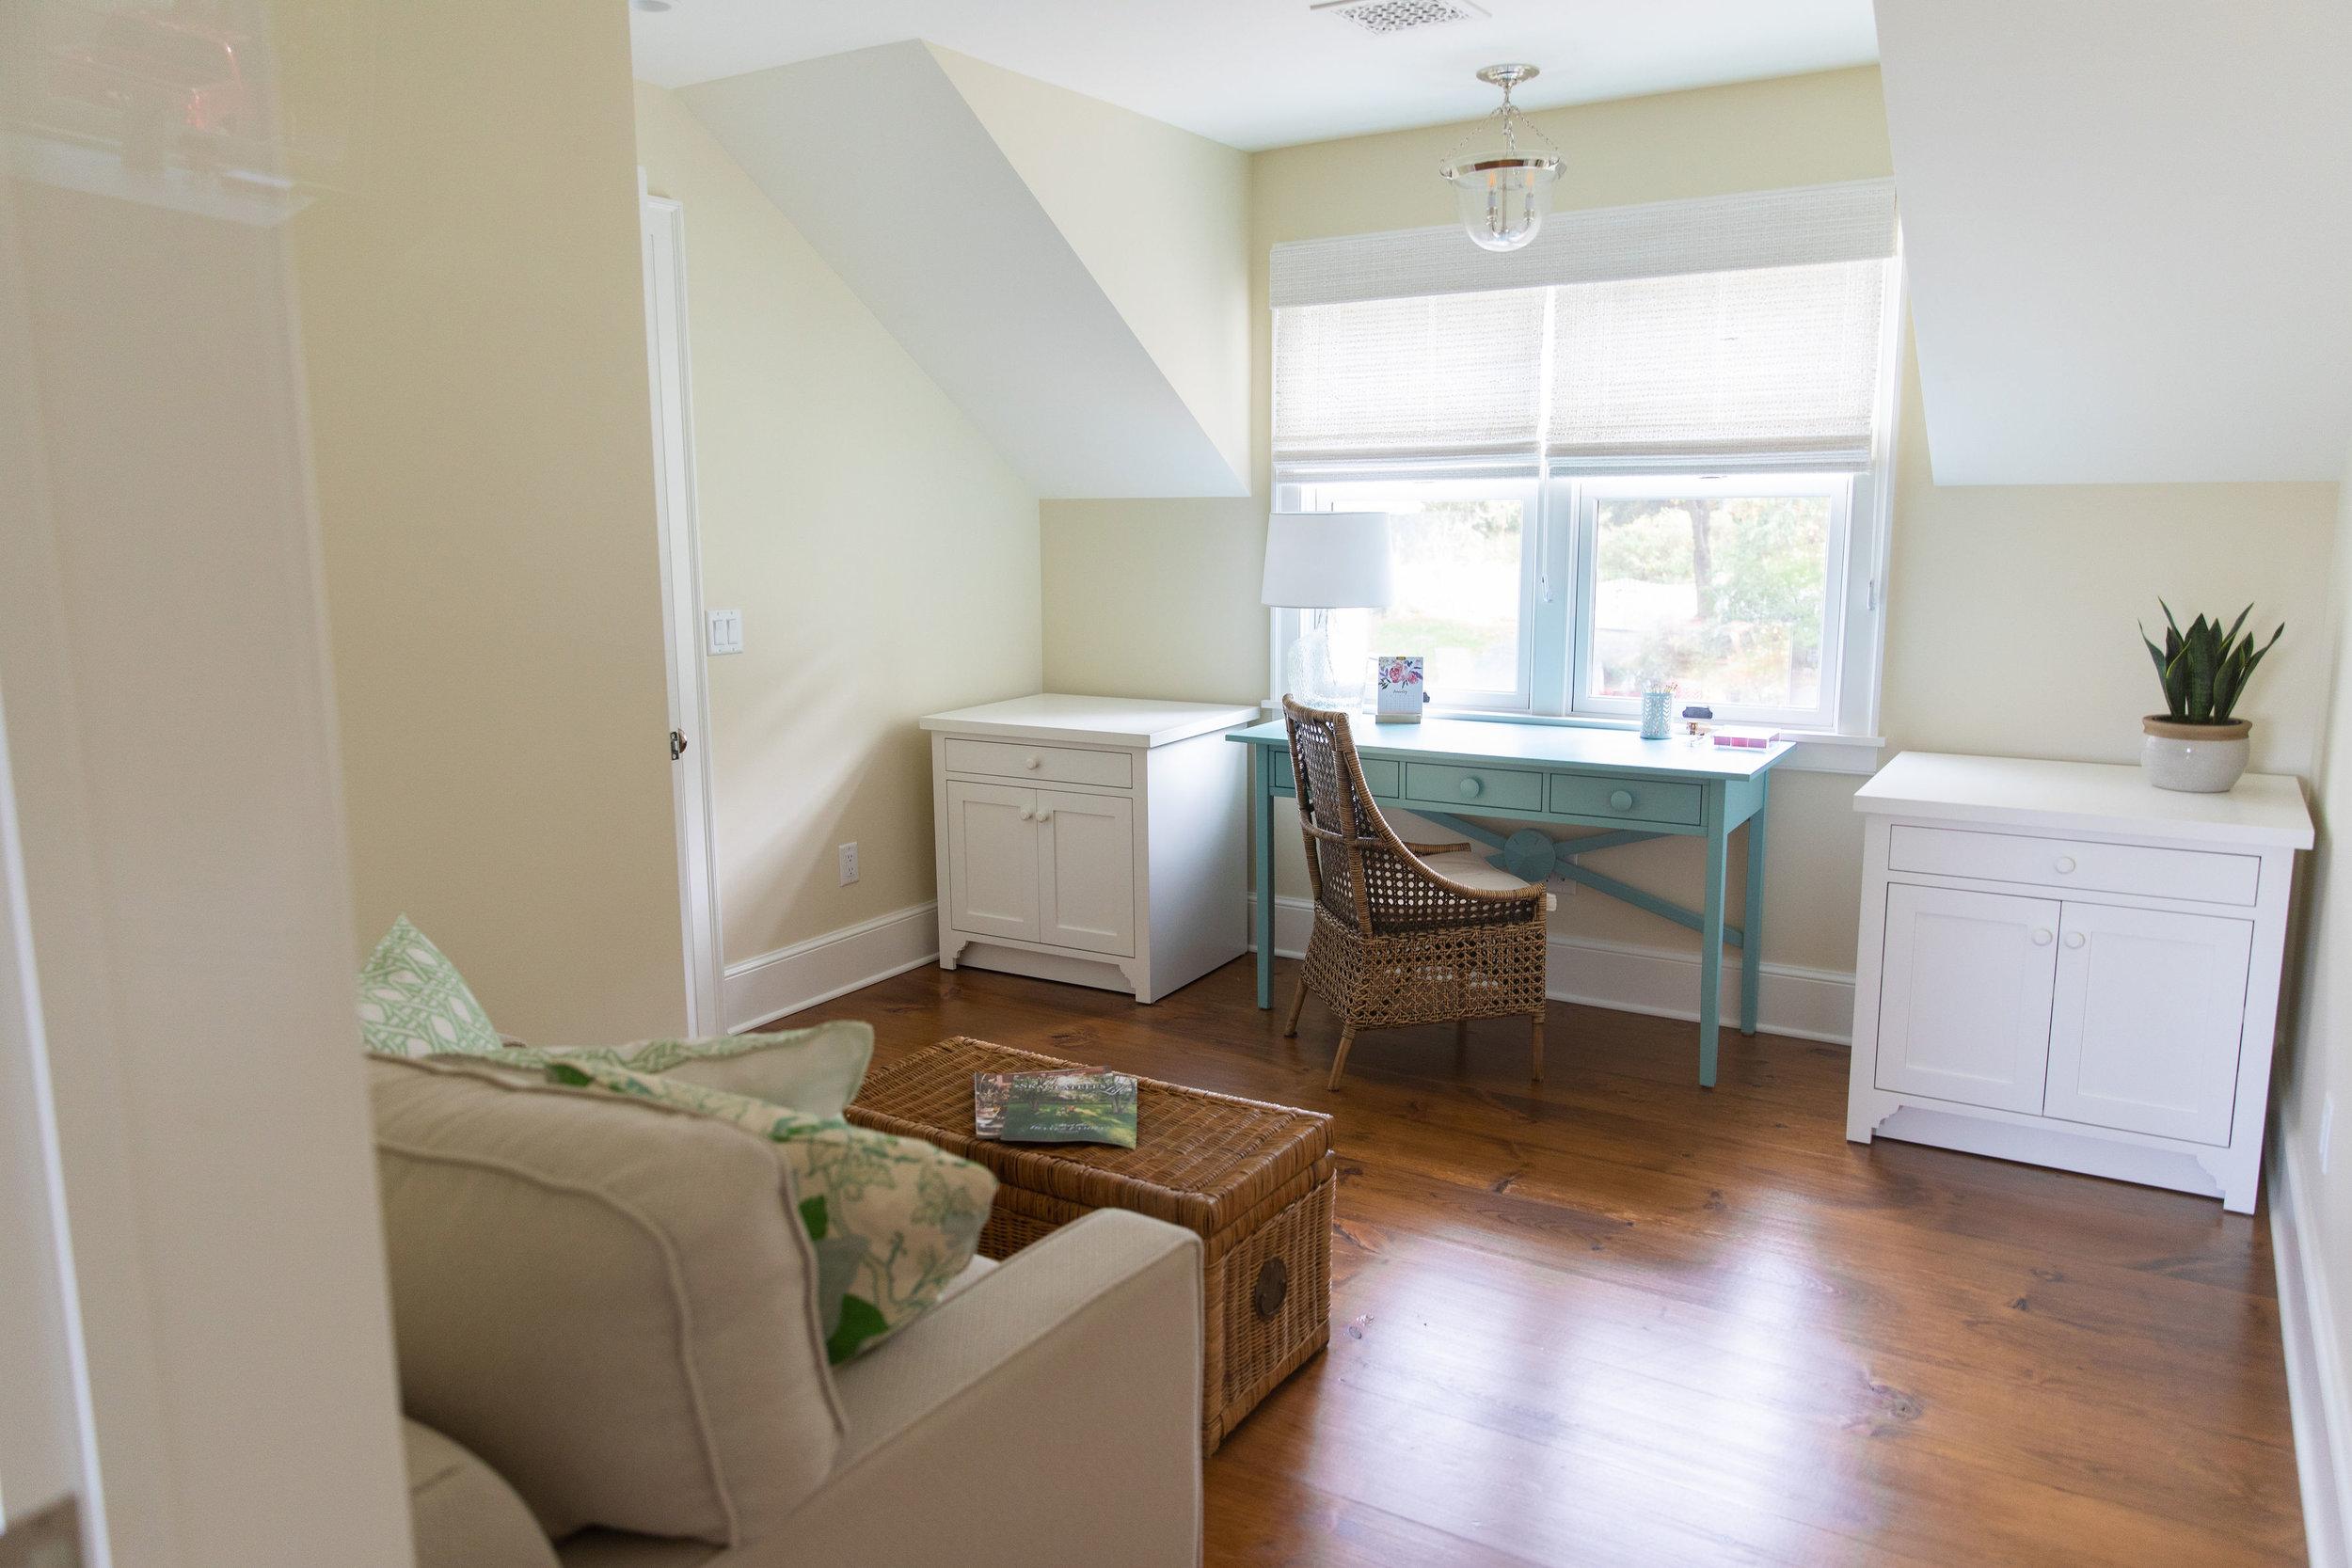 Small house interior design by Teaselwood Design, Skaneateles, NY interior designer